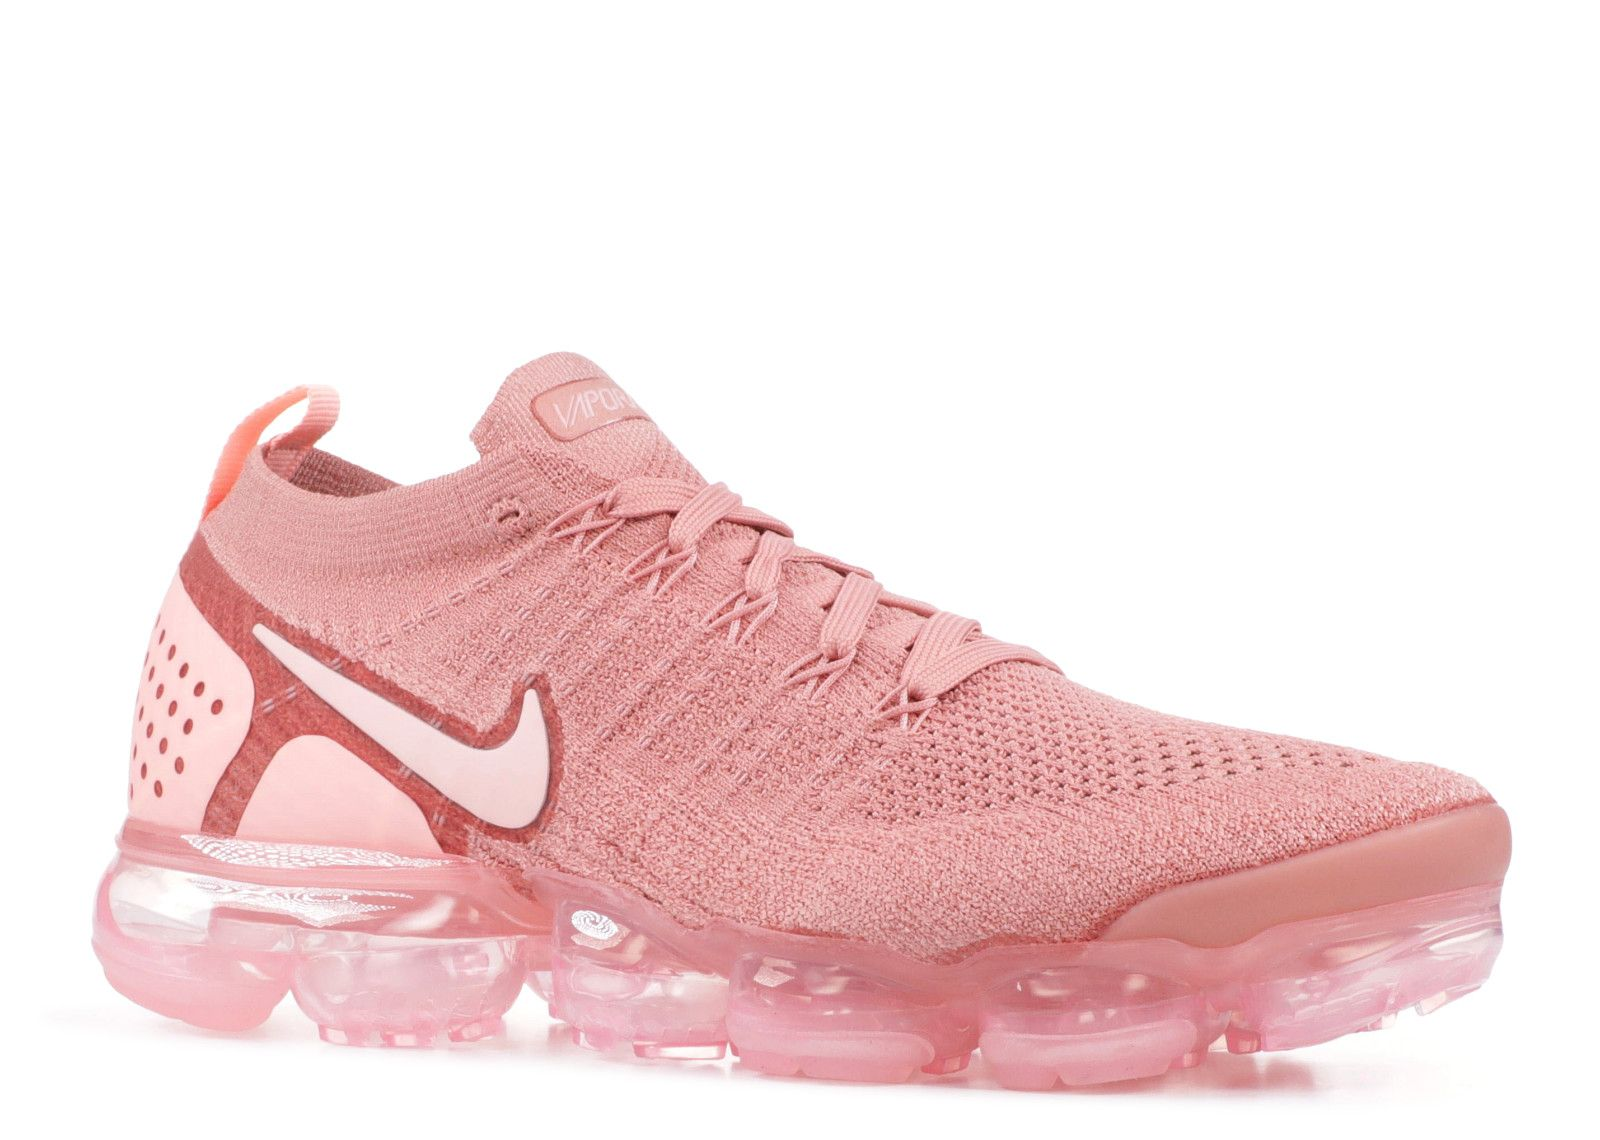 nike vapormax flyknit 2 pink